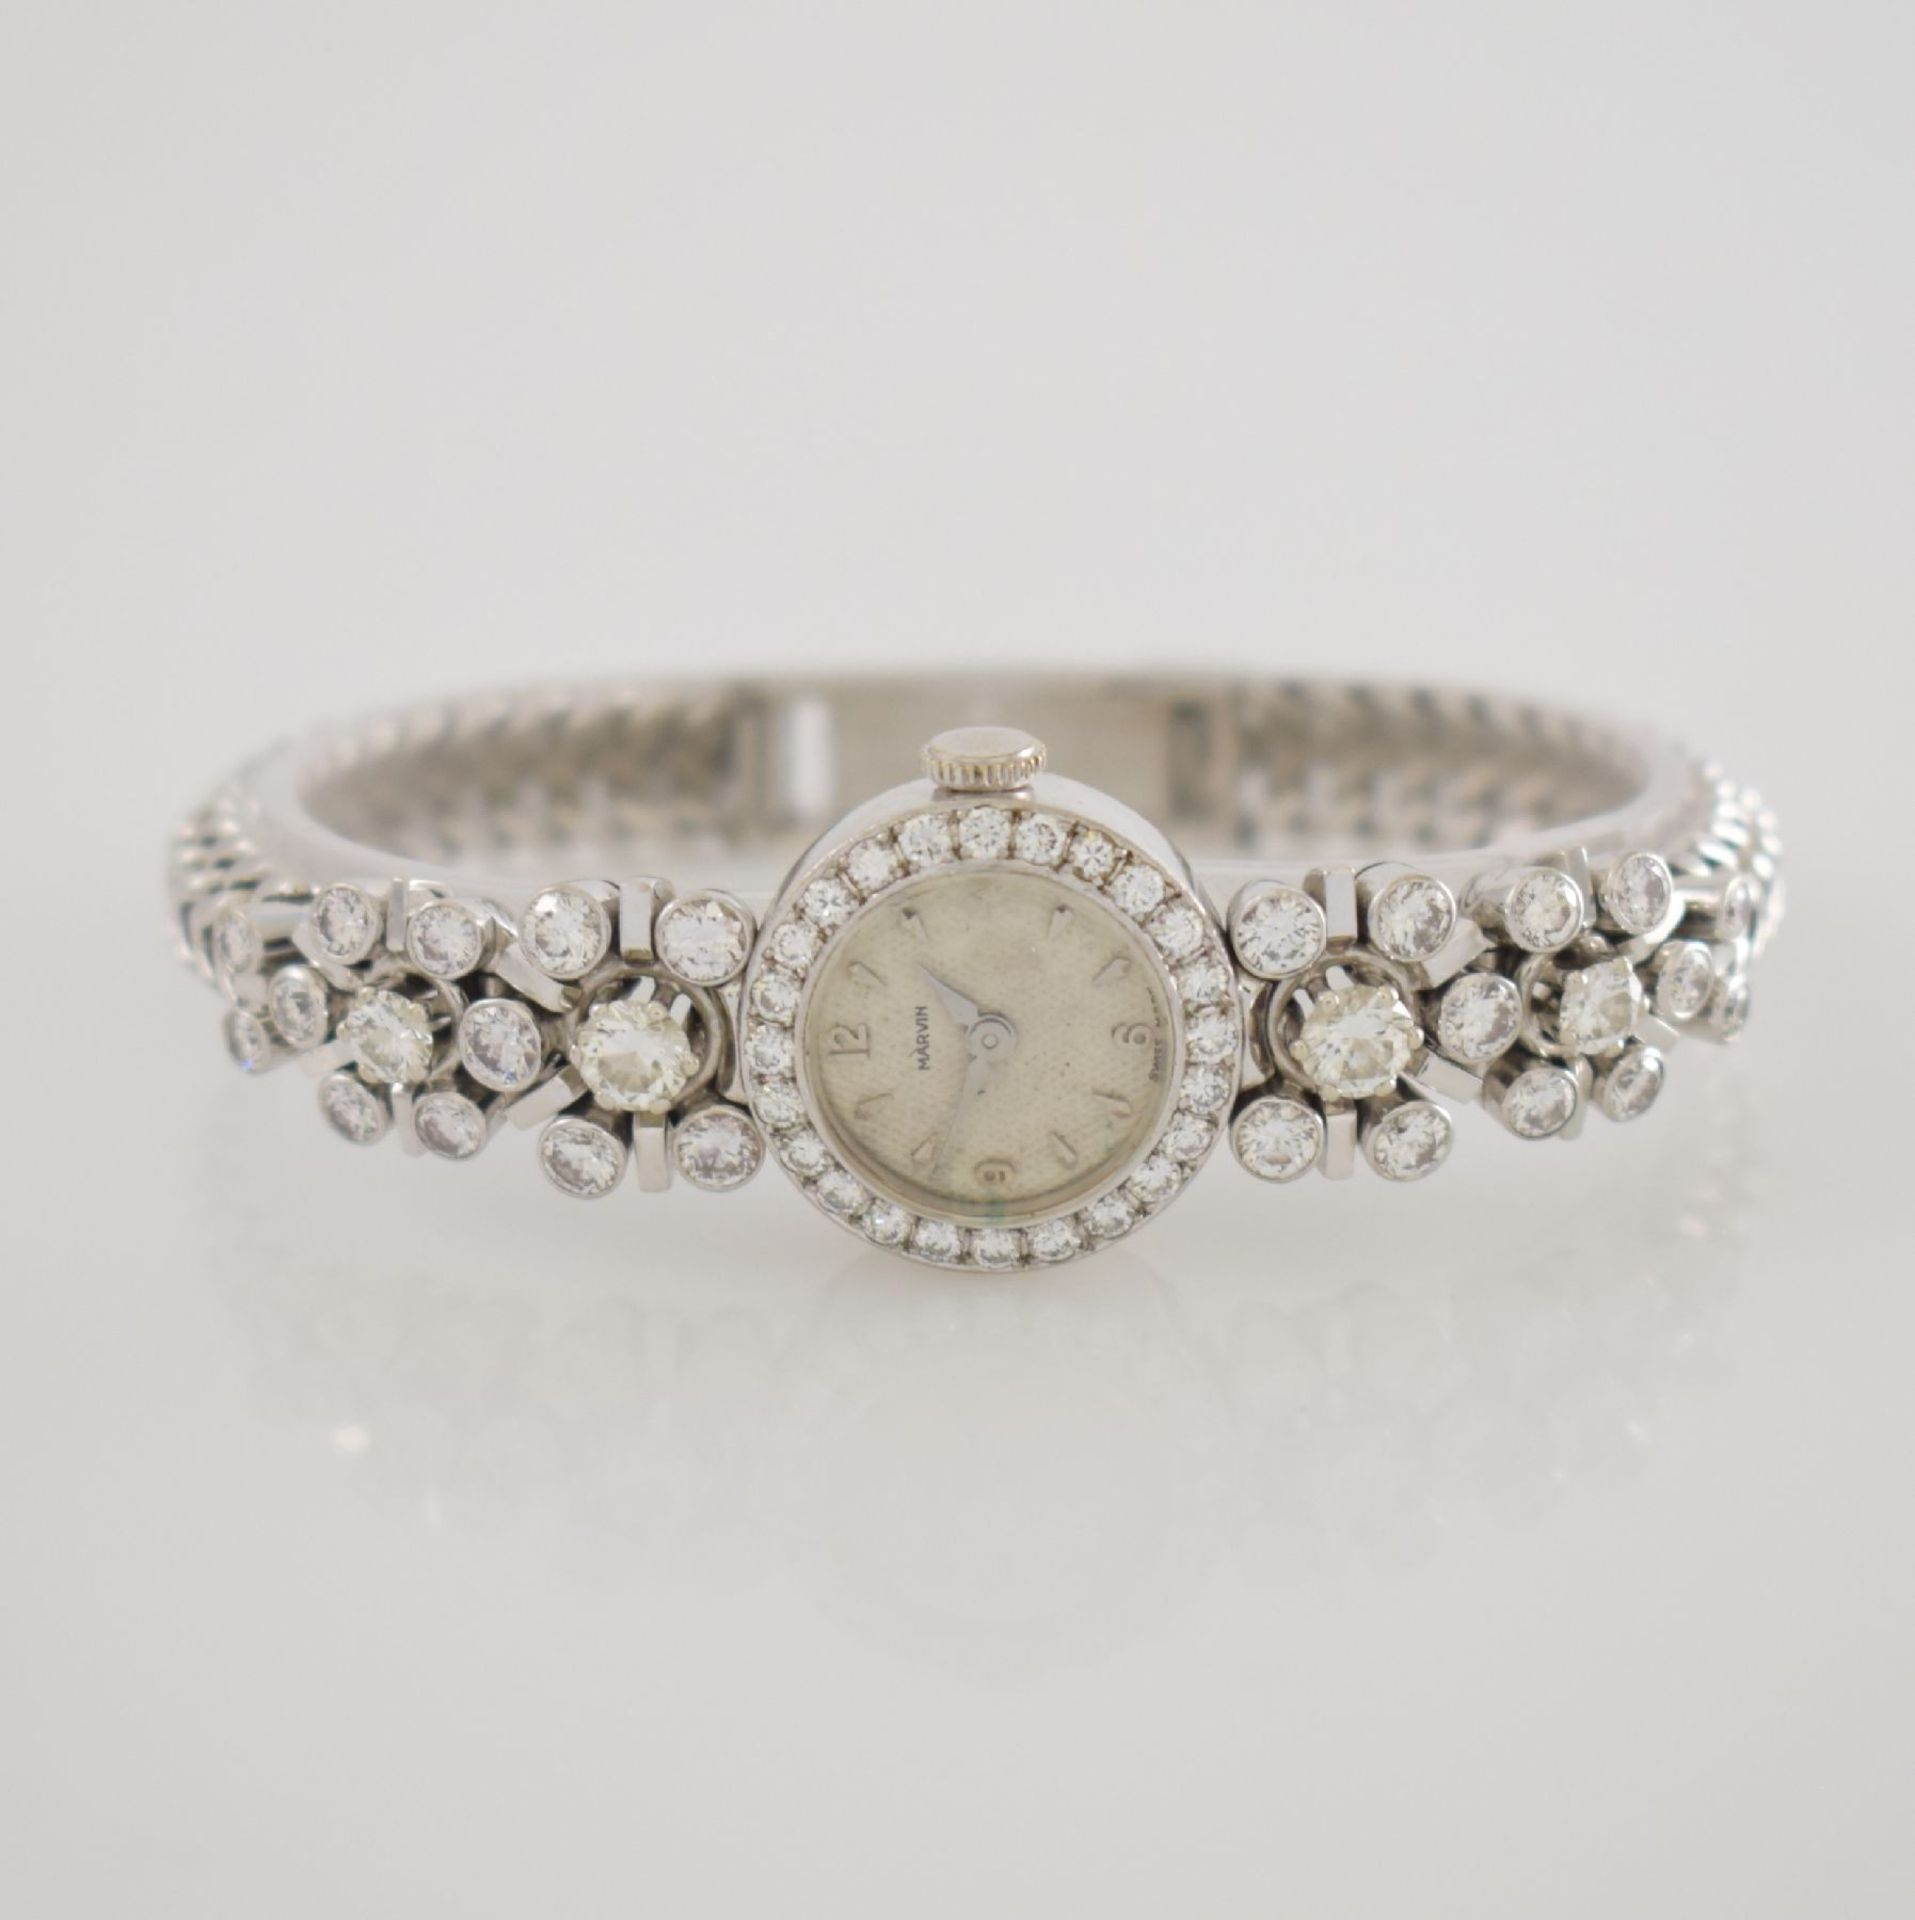 MARVIN Art Deco ausgefallene Damenarmbanduhr in WG 585/000 m. Diamanten zus. ca. 2,50 ct, Schweiz um